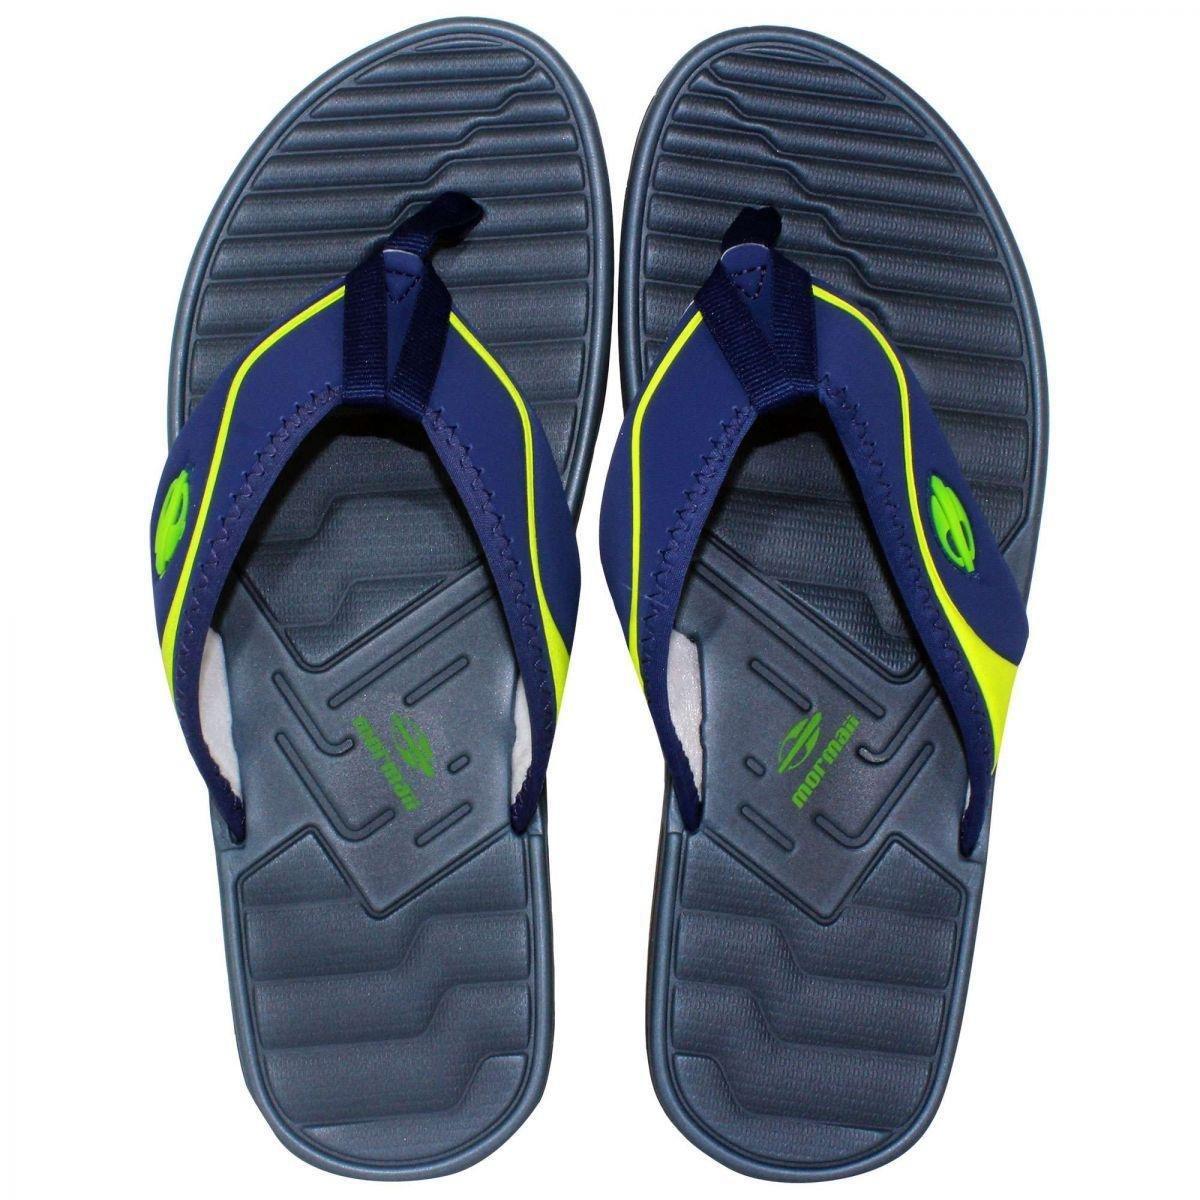 f50b89ac9ad46 Chinelo Mormaii Quiver Pro Dedo Ad Masculino - Azul e Verde - Compre Agora